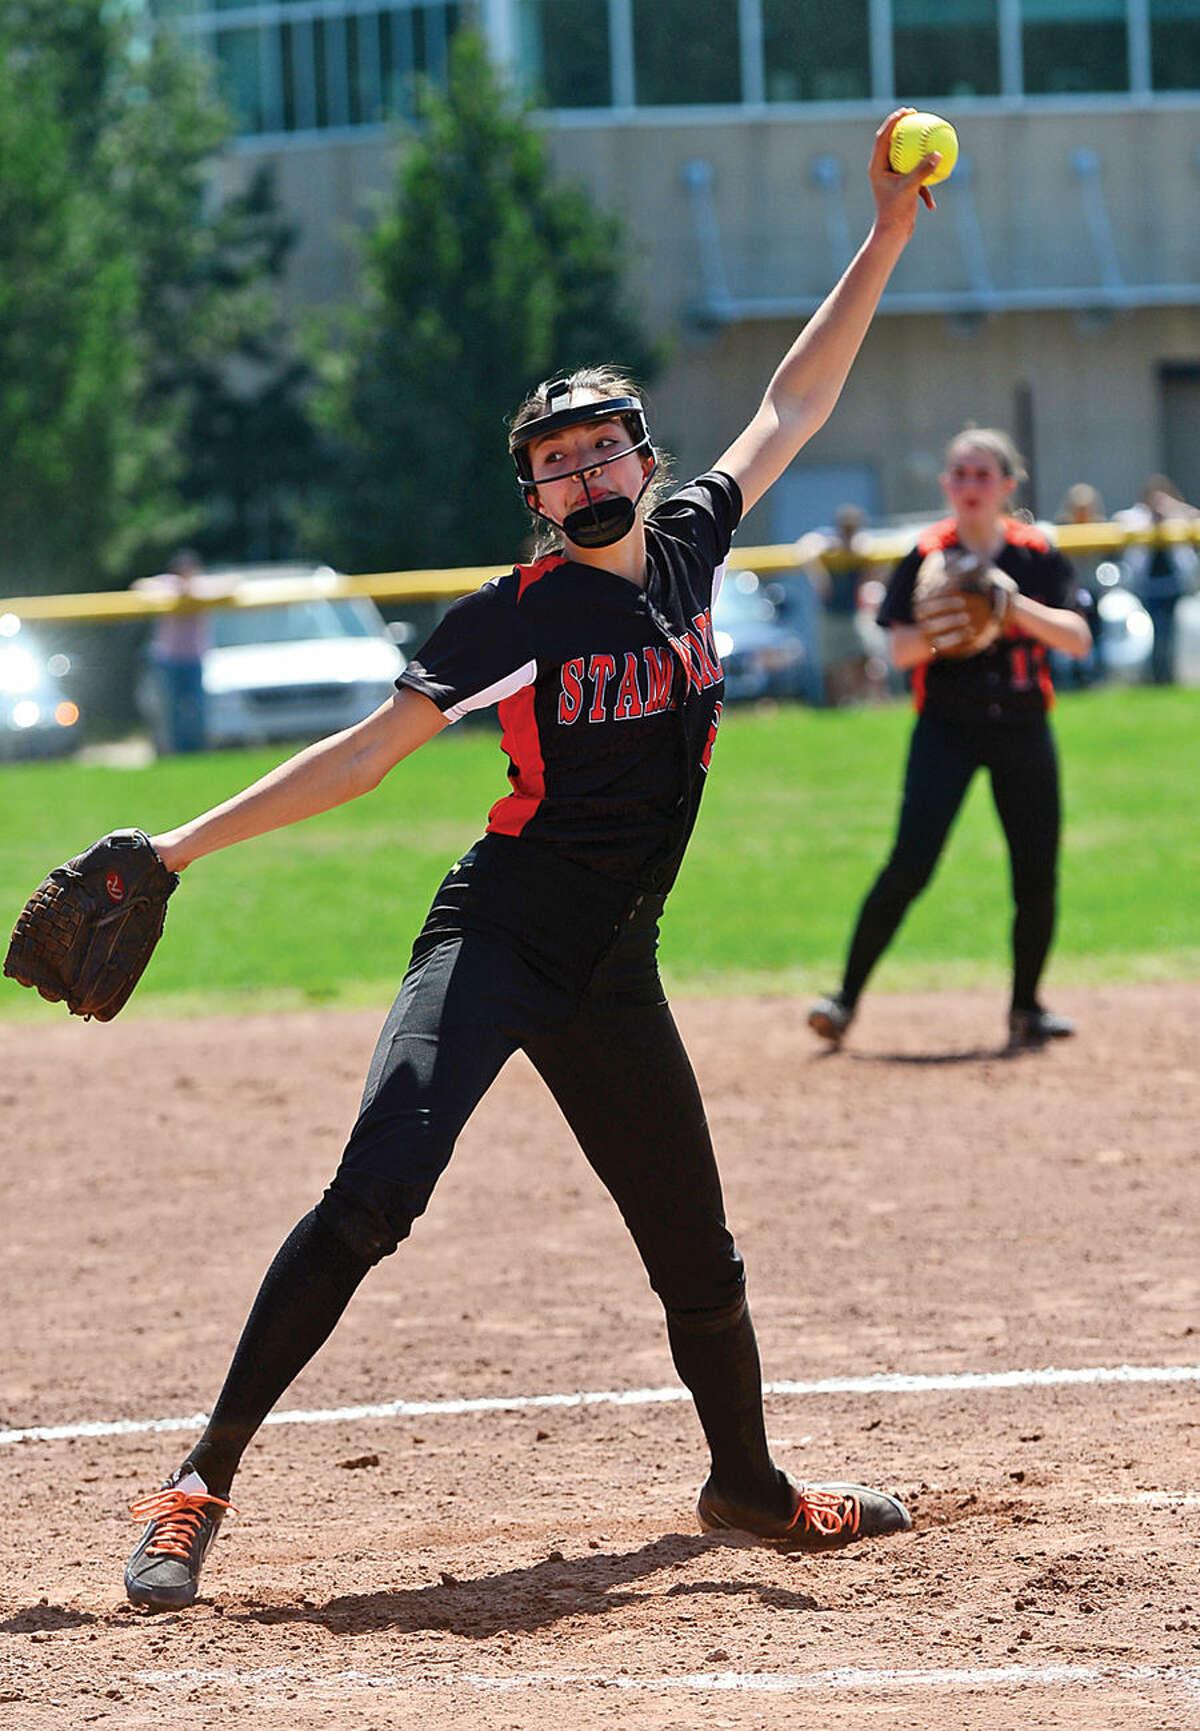 Hour photo / Erik Trautmann Stamford's pitcher Sara Staley throws during their softball game against Westhill High School Saturday.